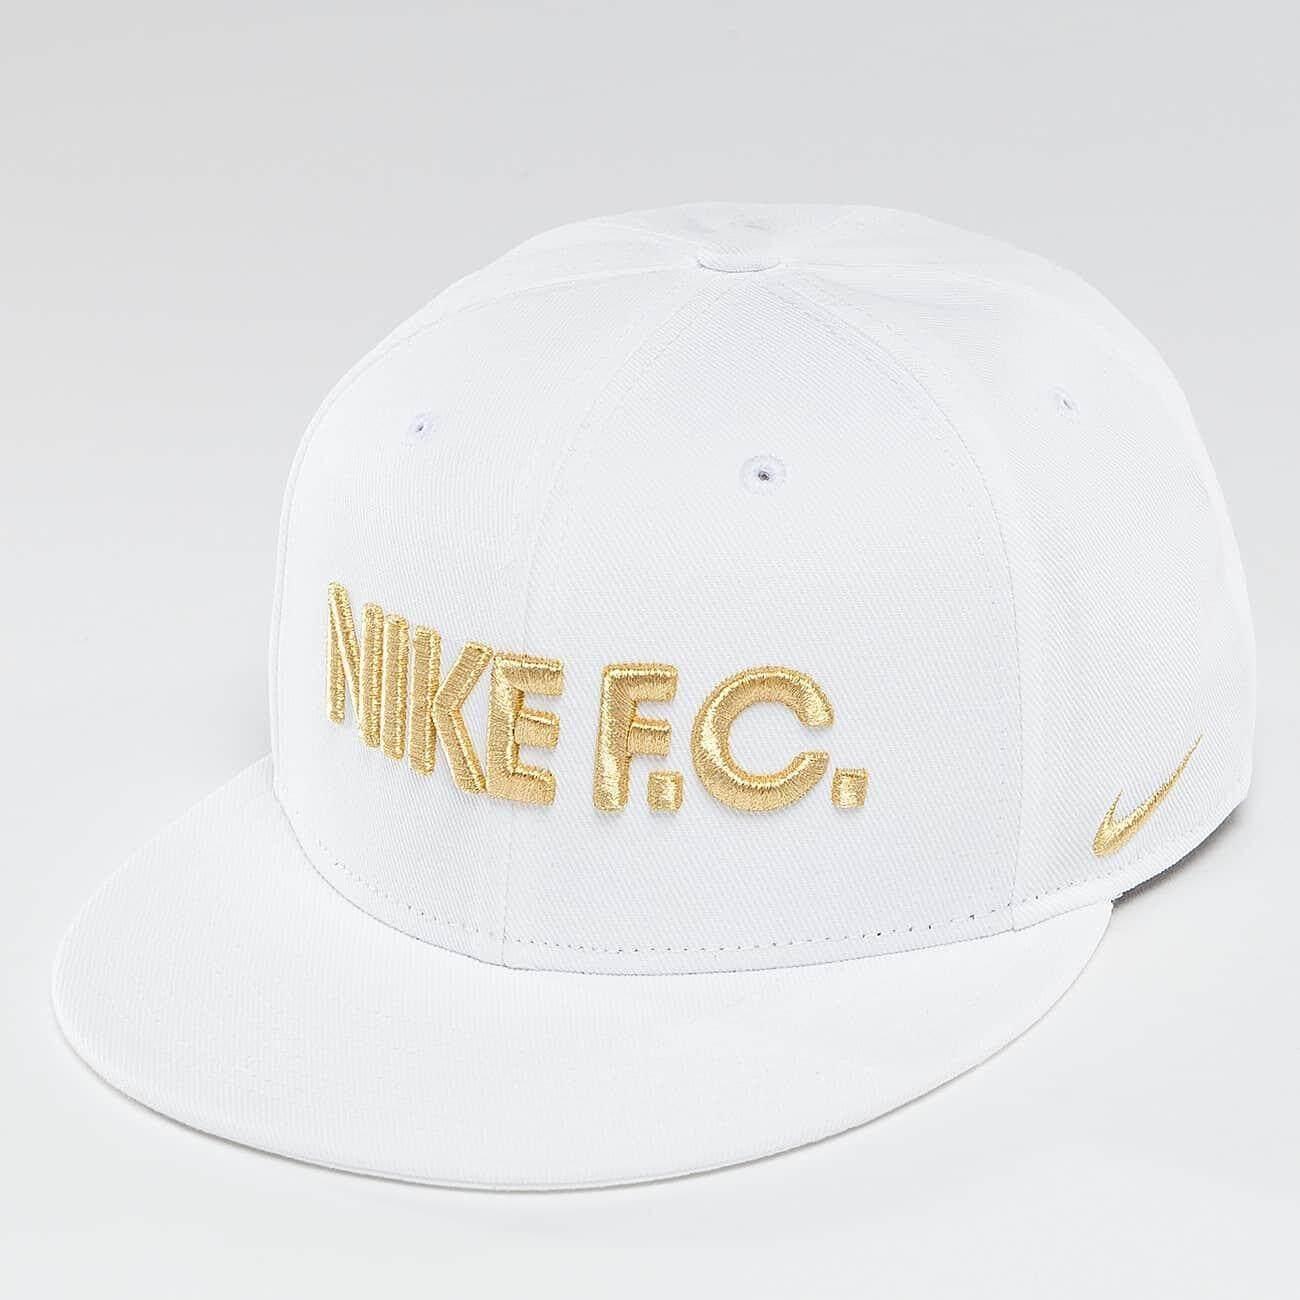 bd1e4cd4 Nike Topi price in Malaysia - Best Nike Topi   Lazada